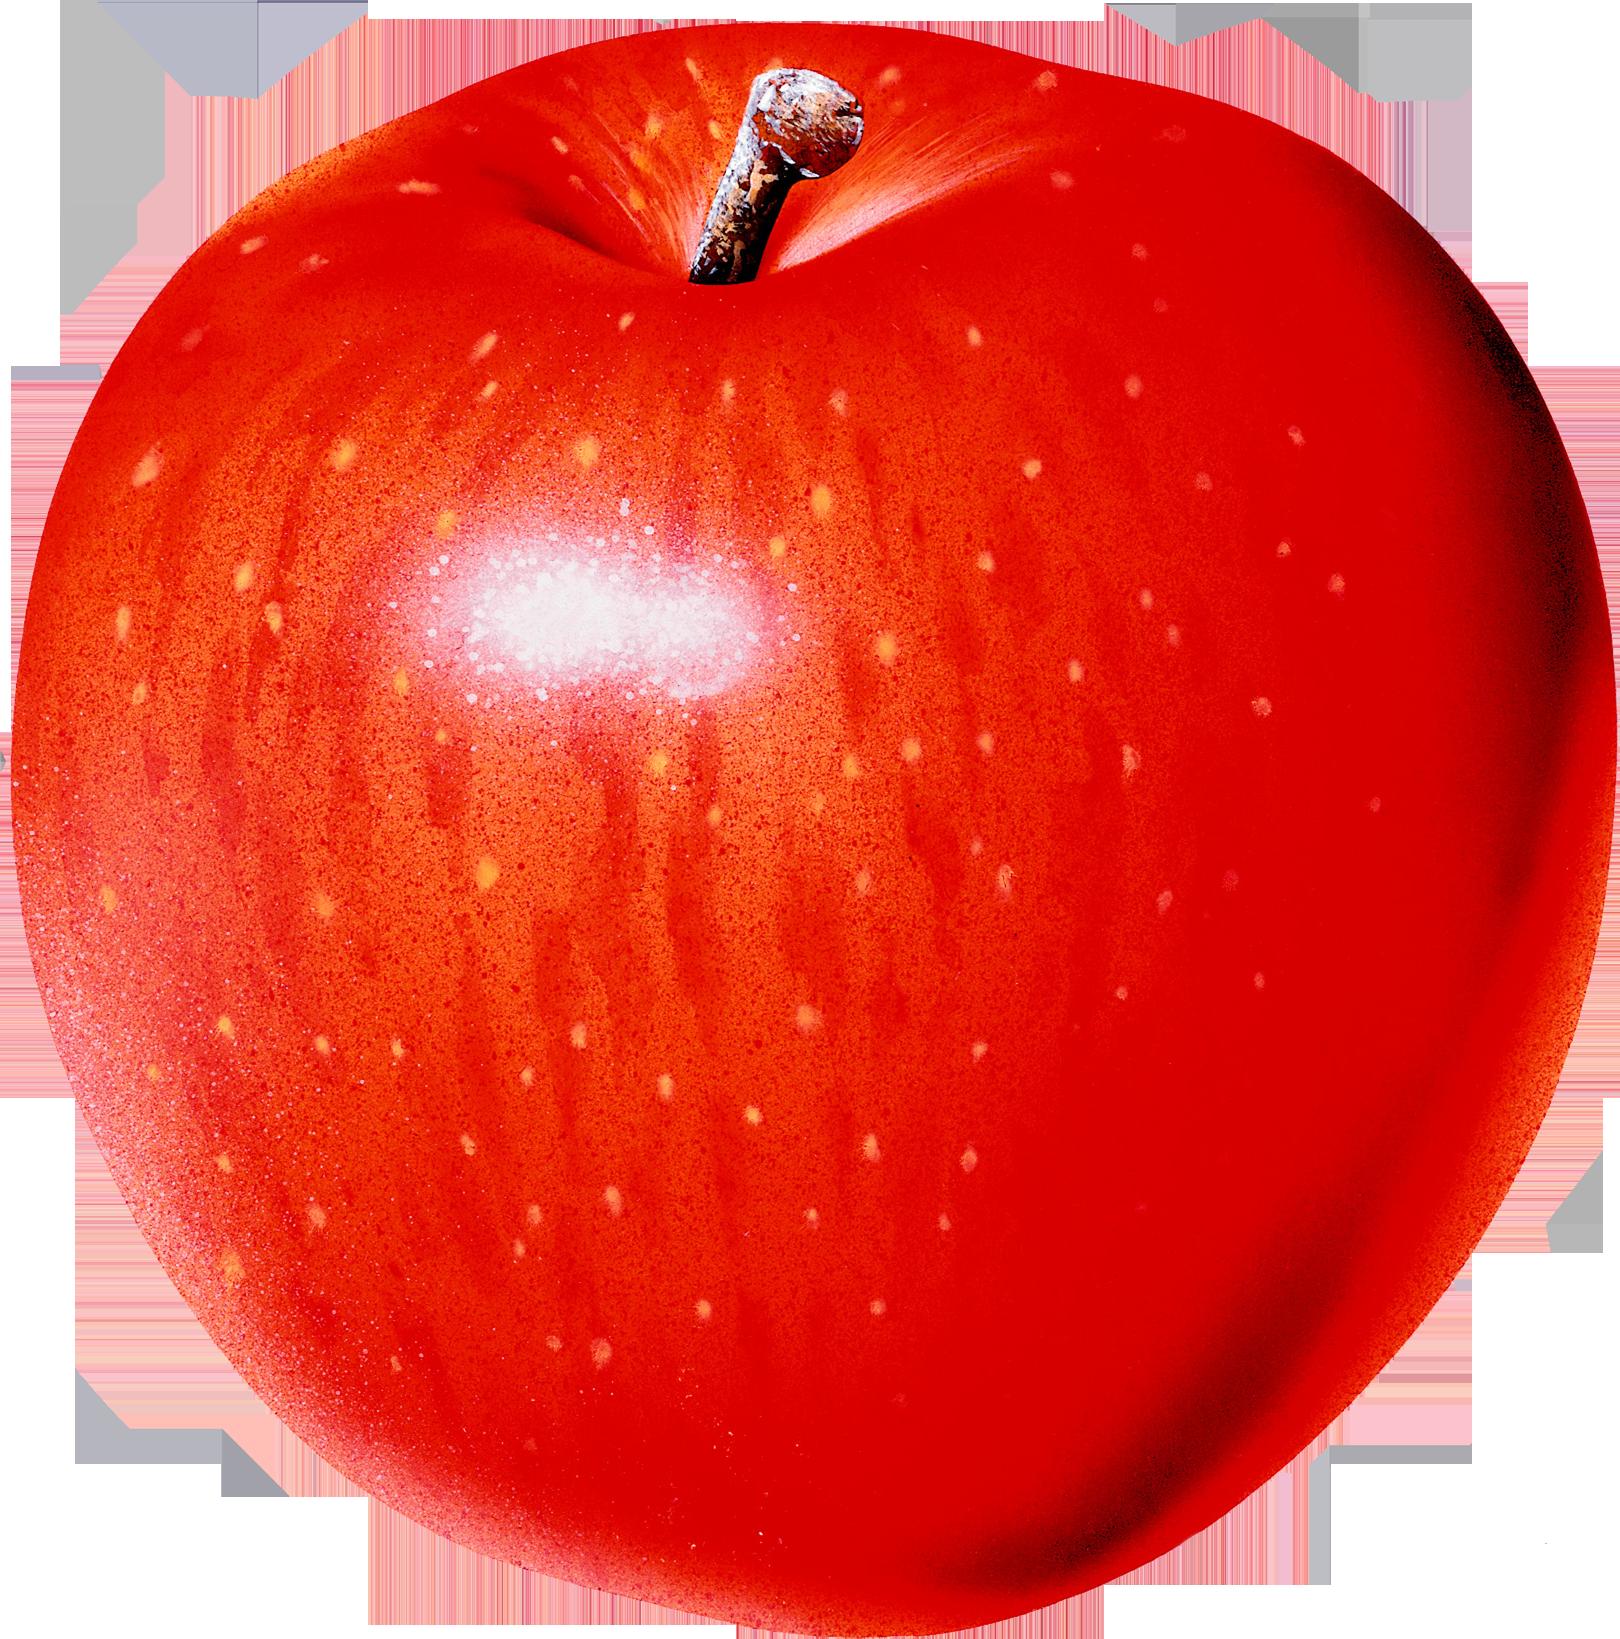 Red Apple S Red Apple Fruit Apple